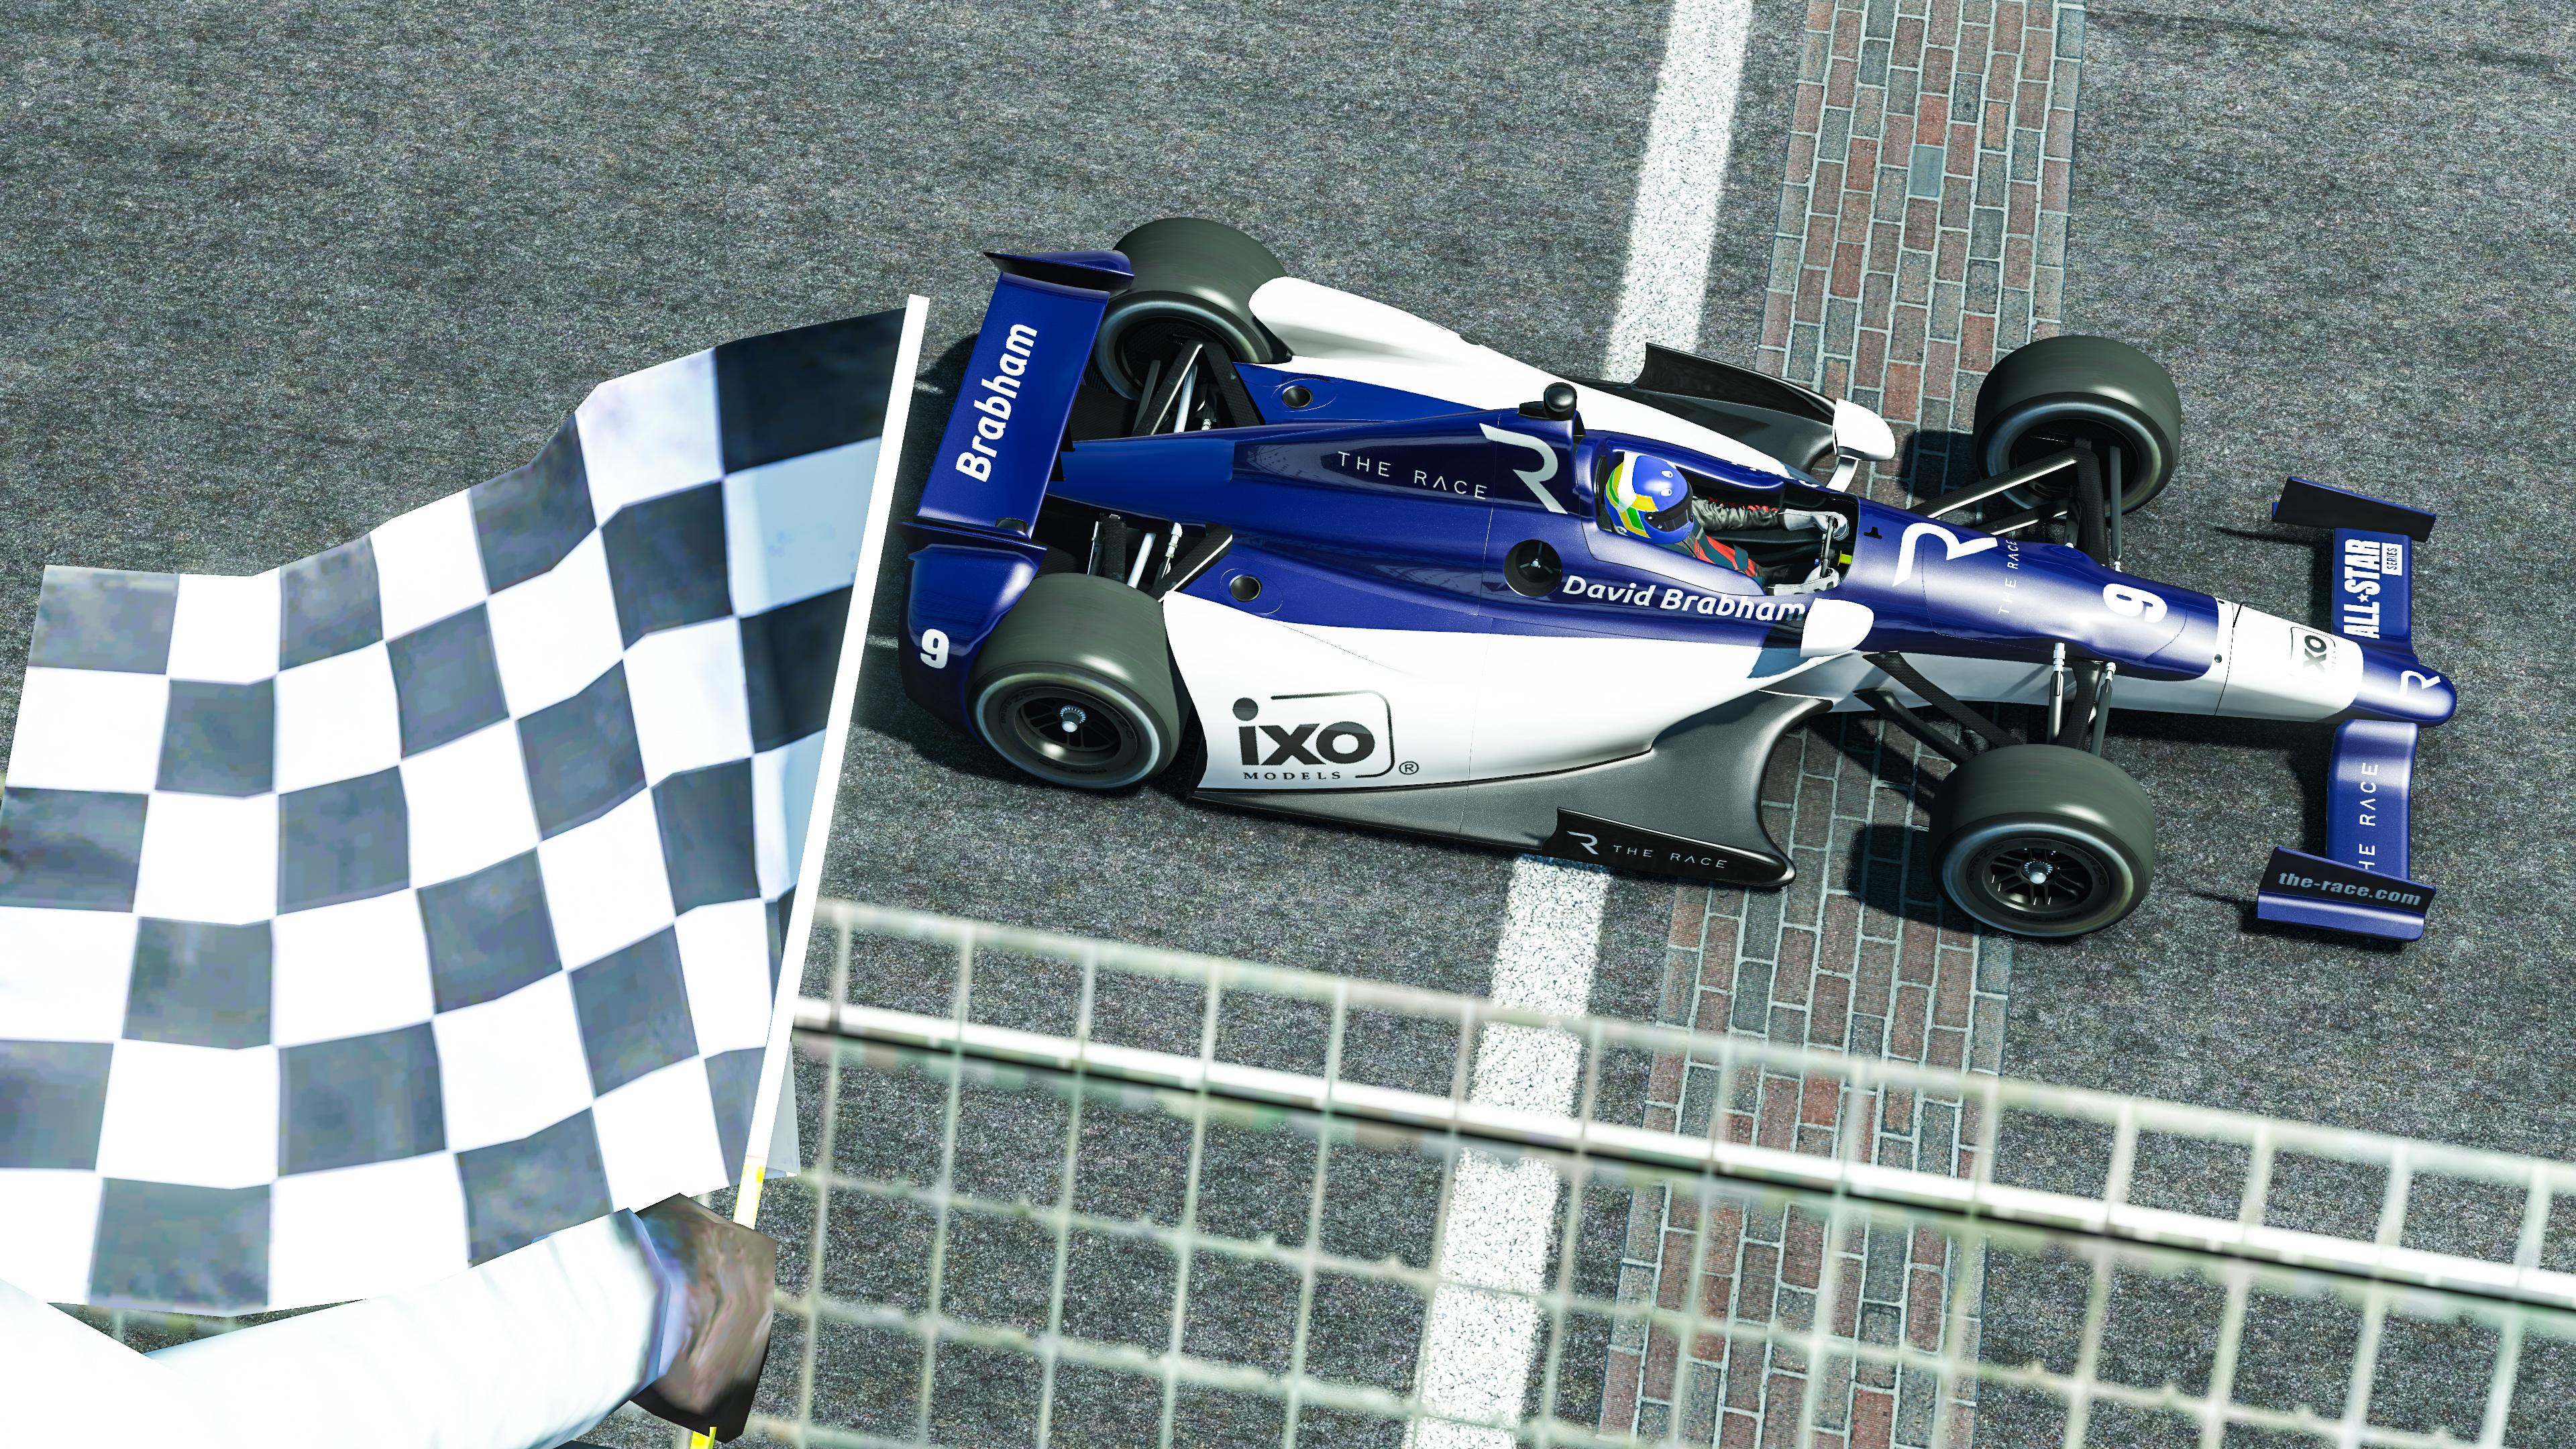 David Brabham The Race Legends Trophy Indianapolis